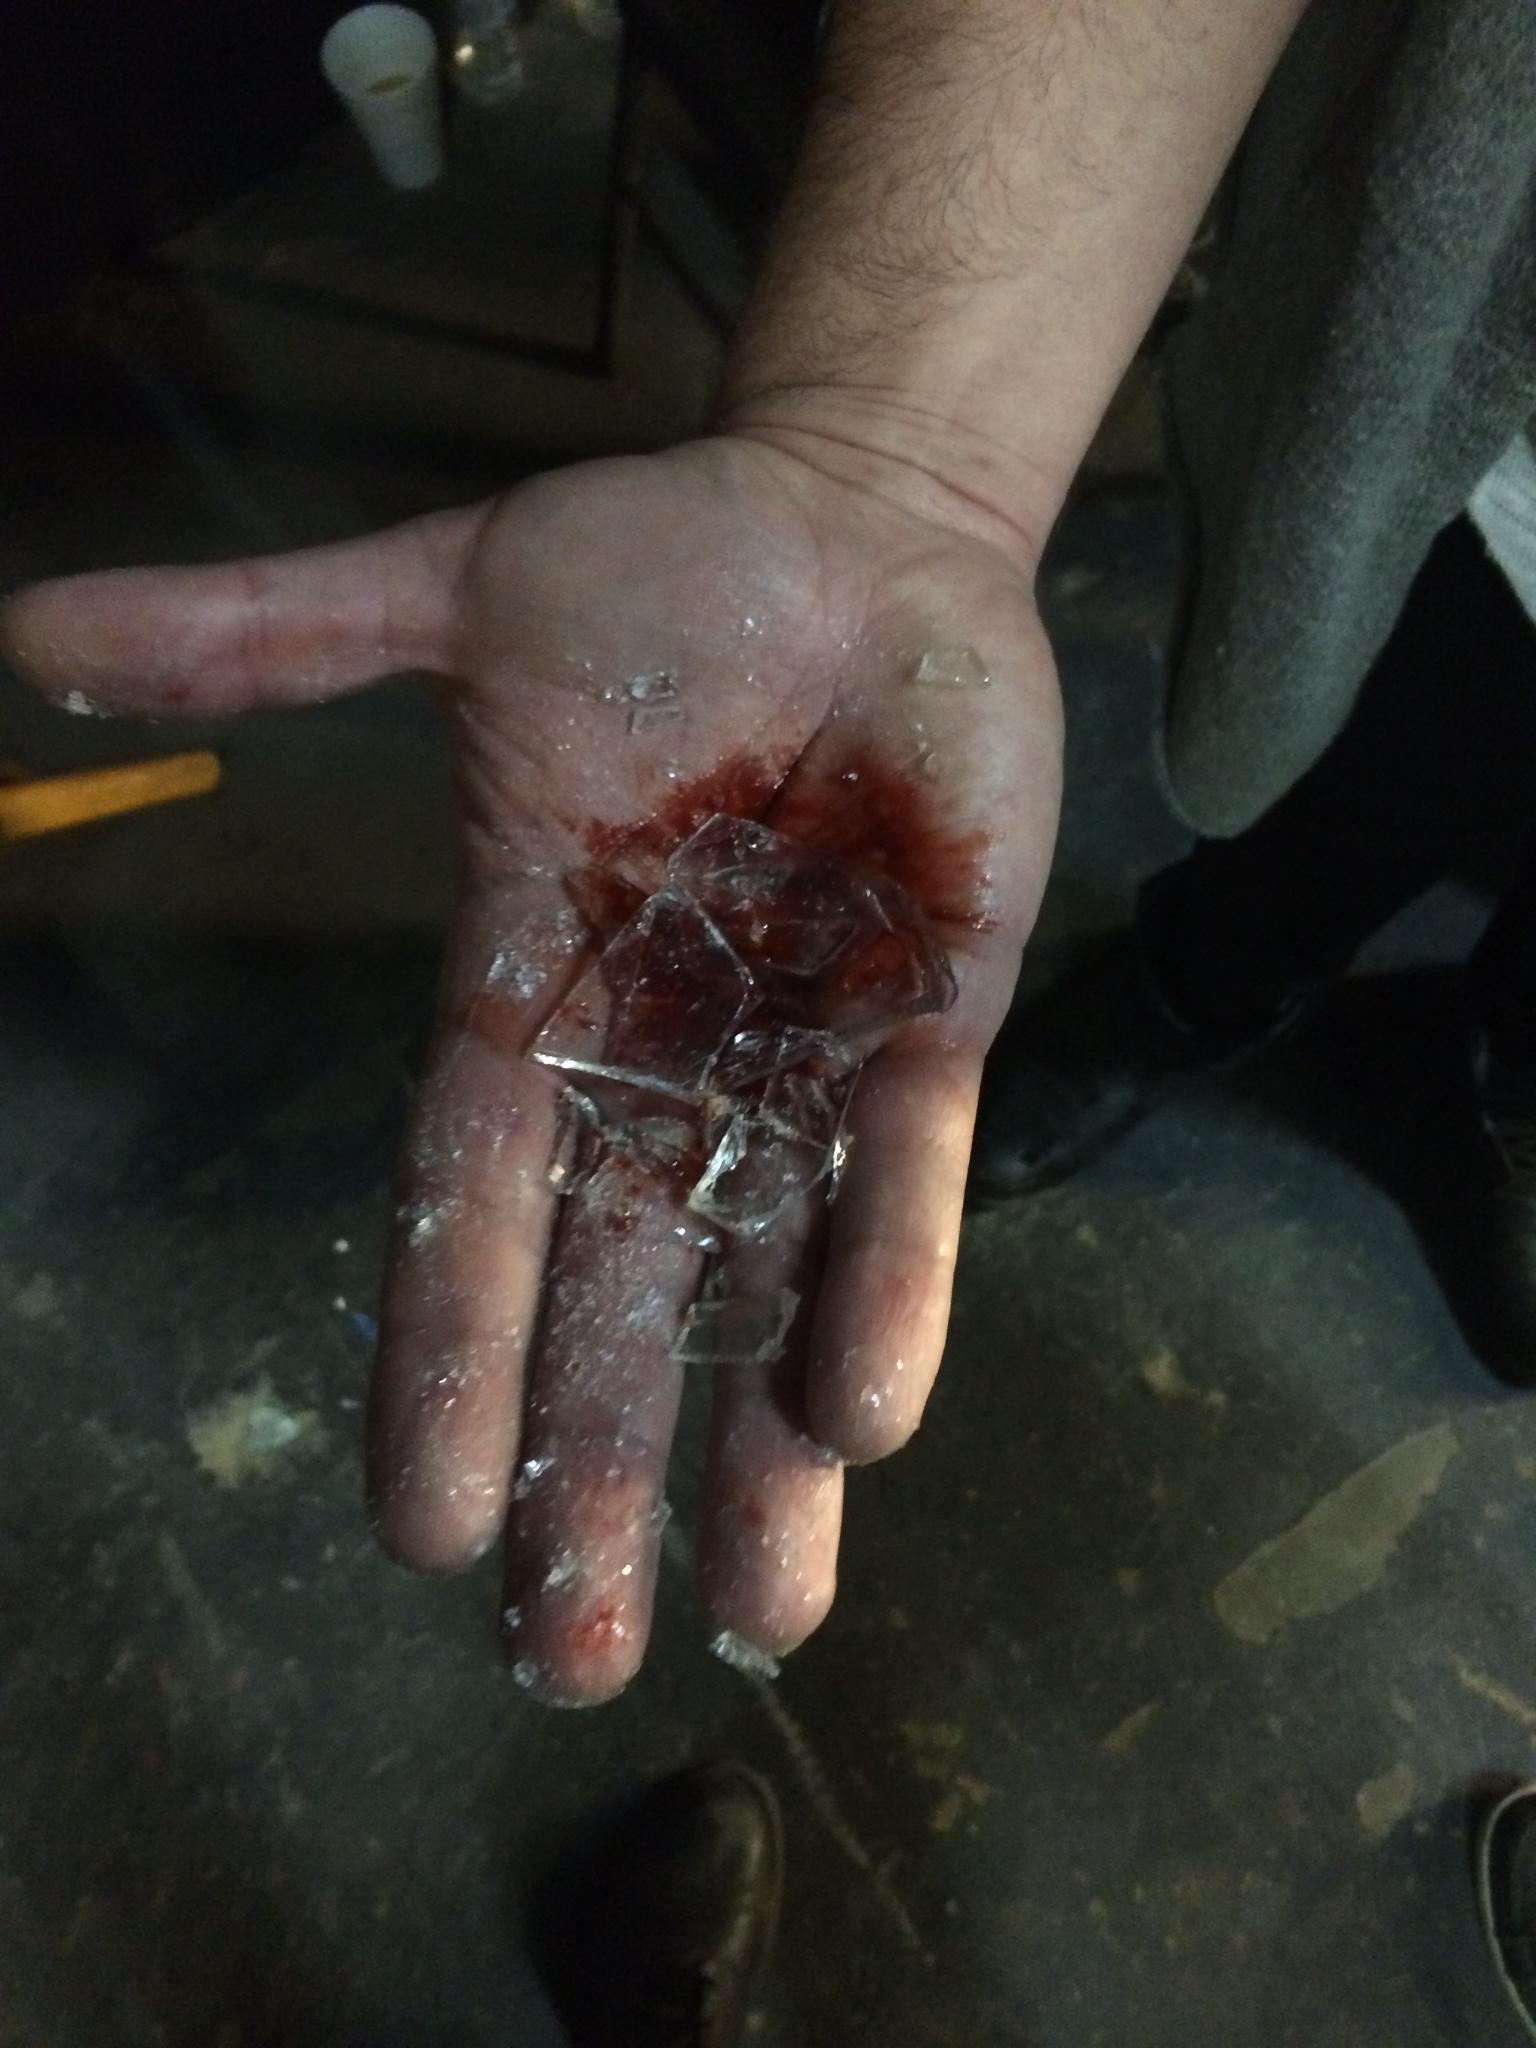 broken-glass-intricate-vengeance.jpg